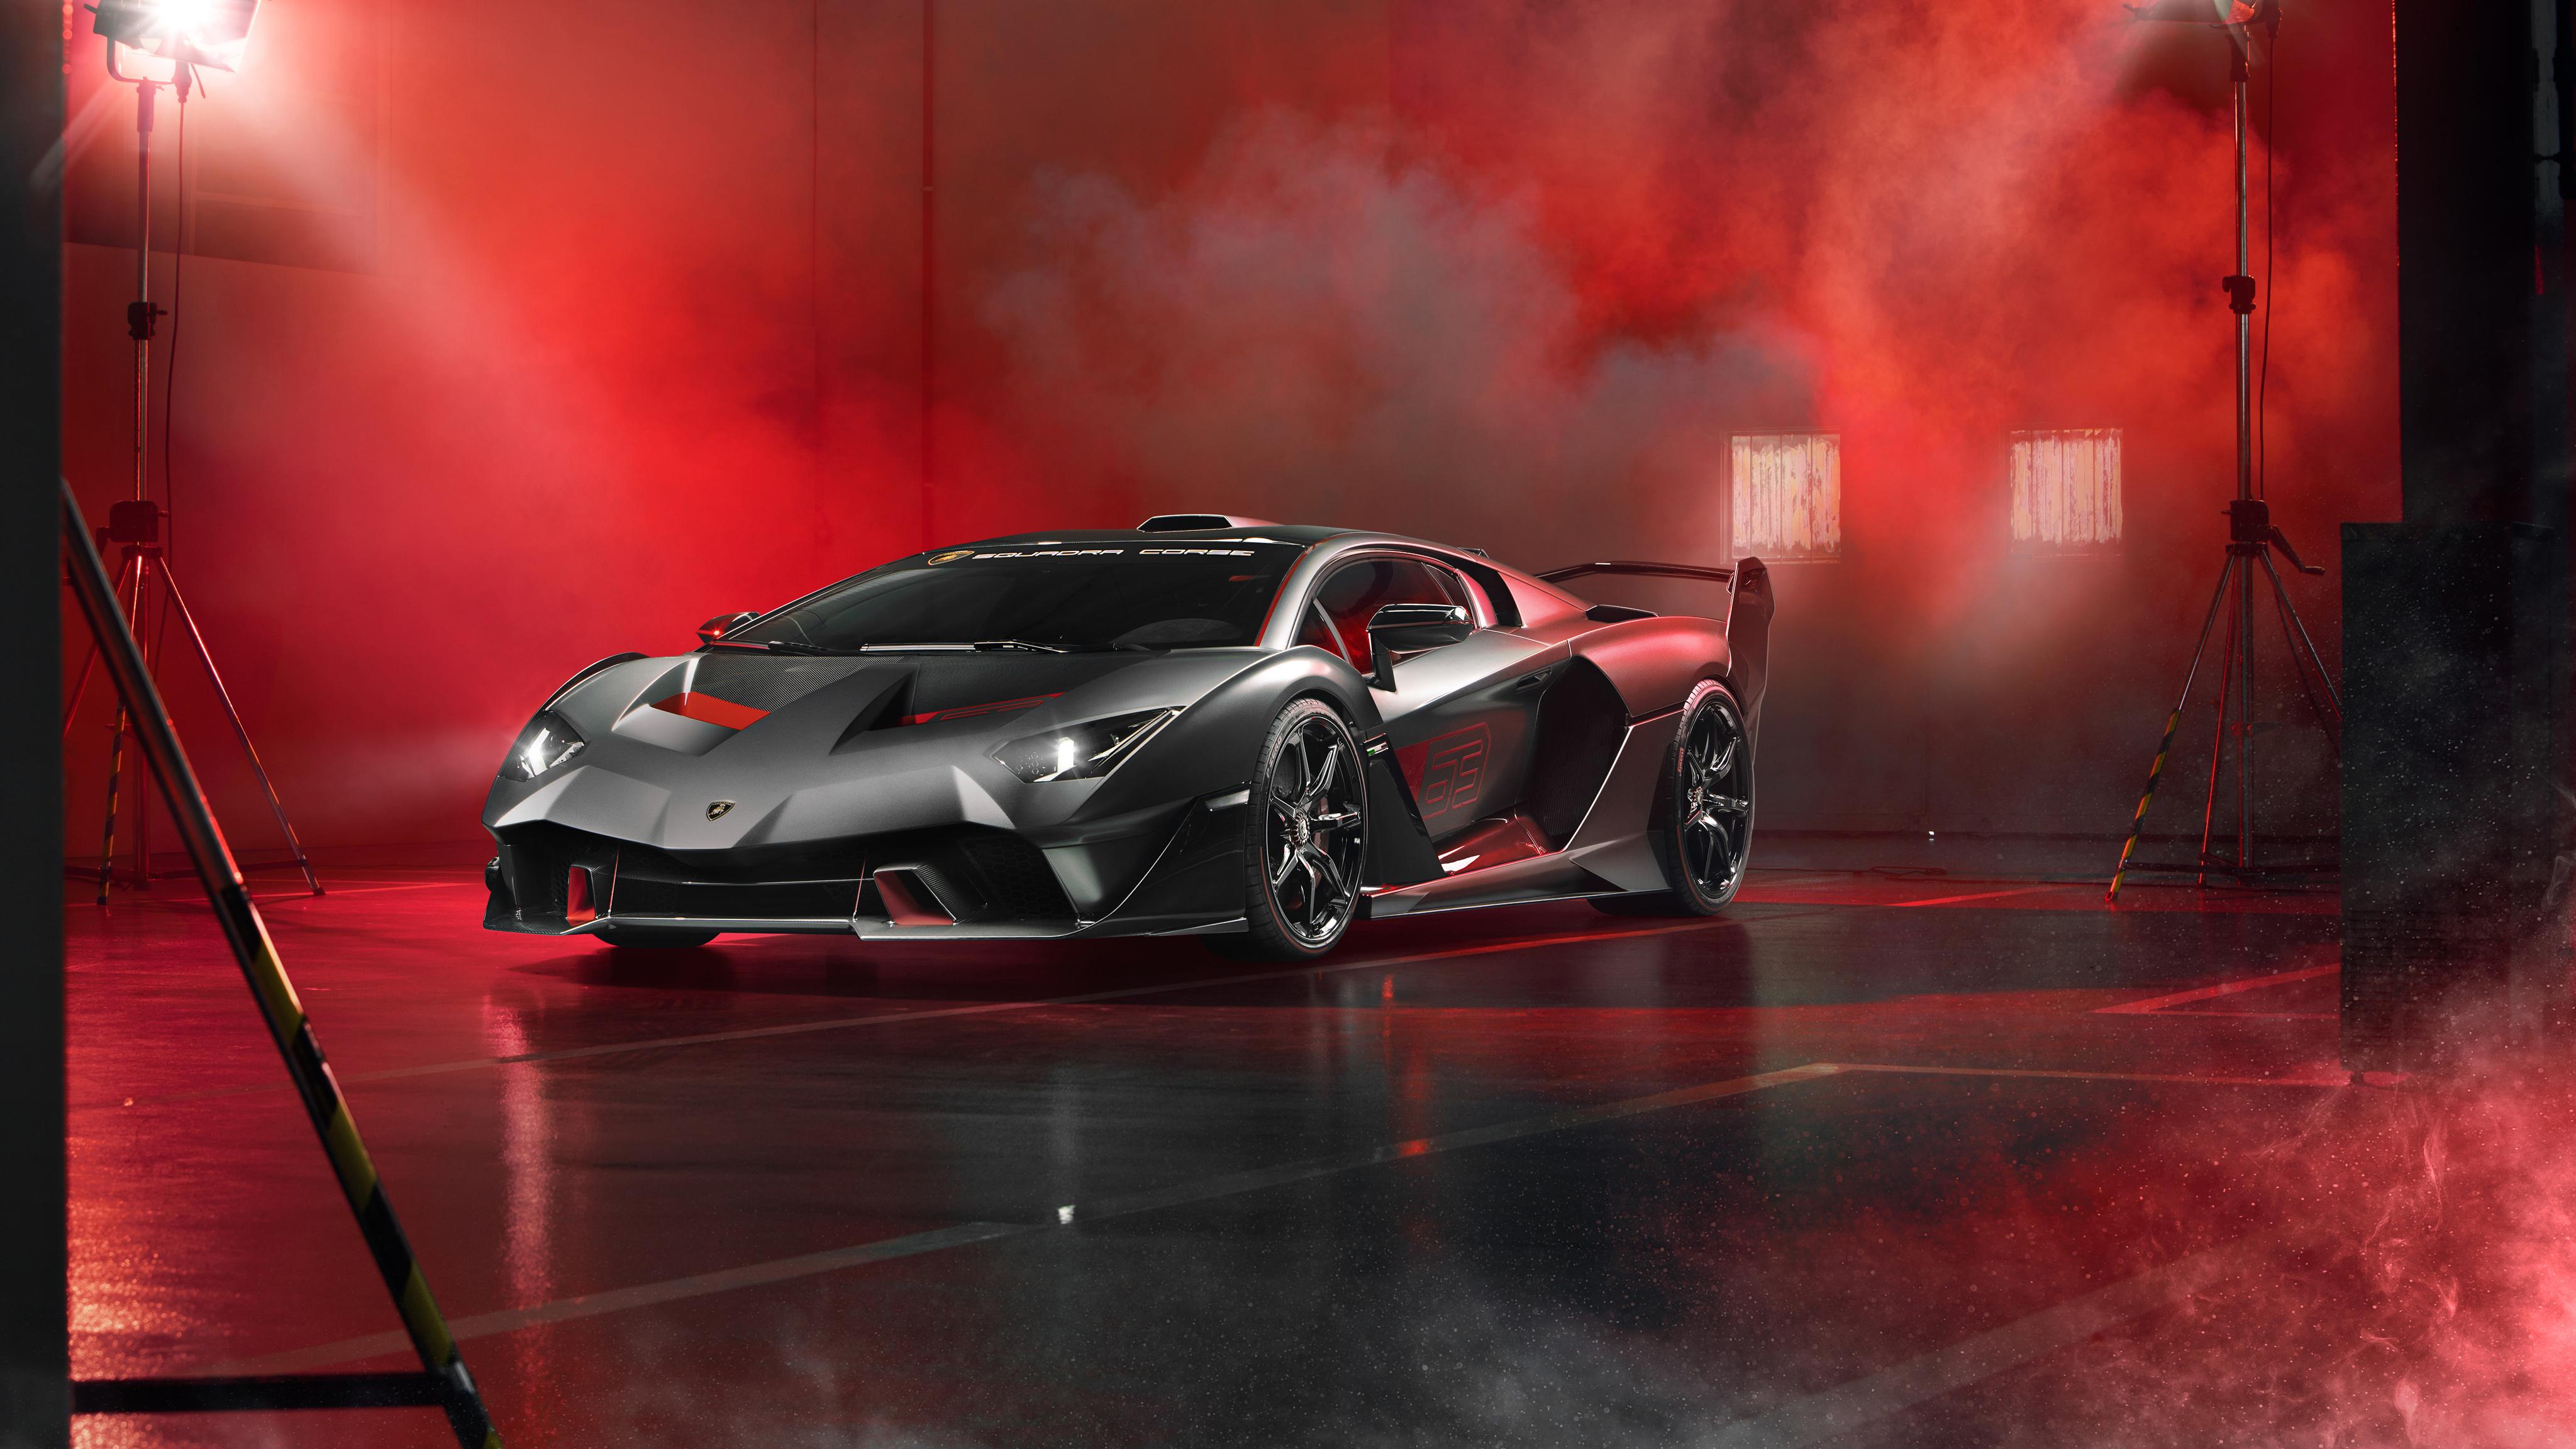 Wallpapers De Carros Lamborghini En Hd: Lamborghini SC18 2019 4K Wallpaper